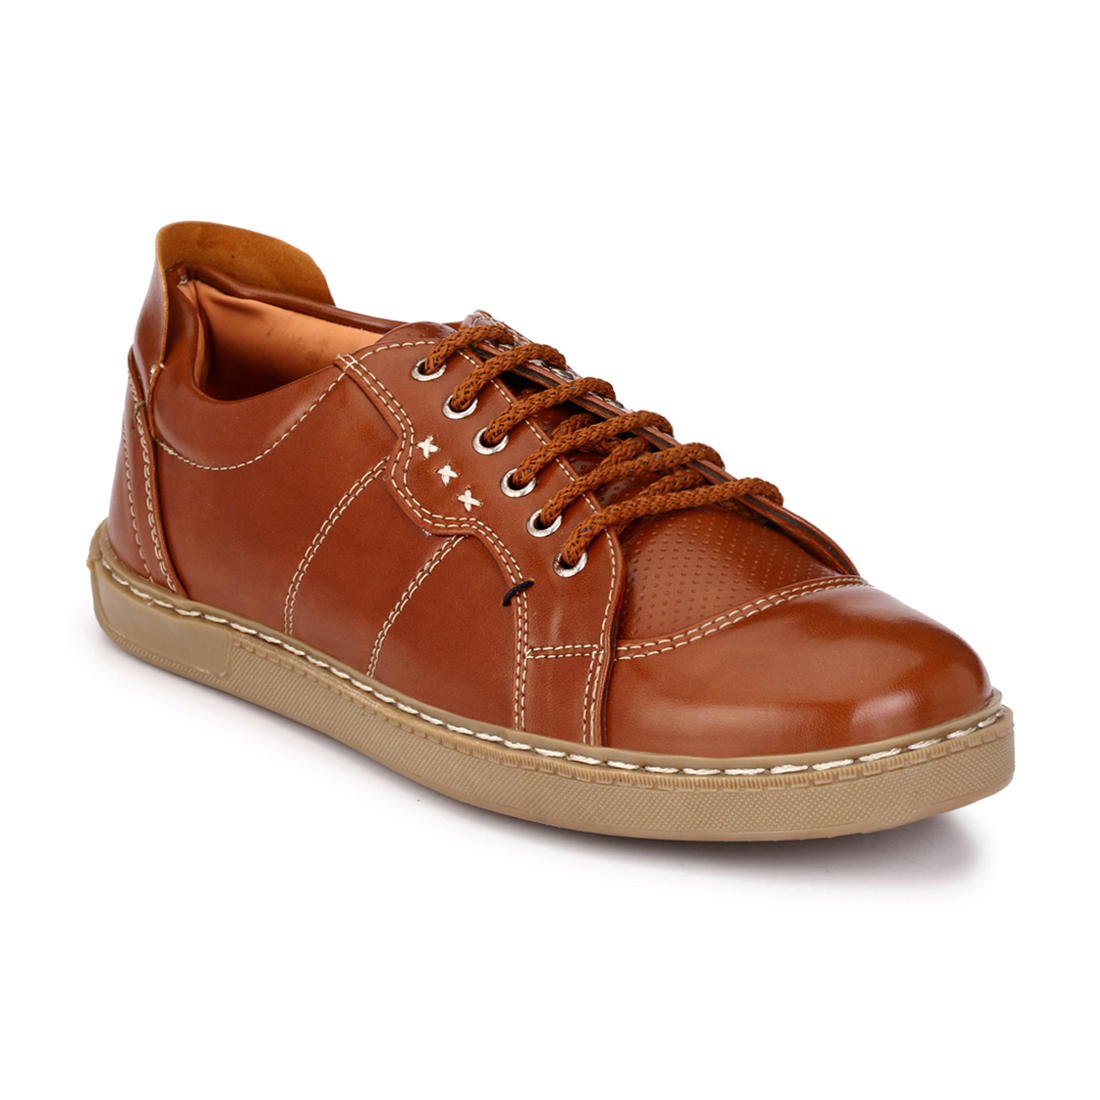 Guava | Guava Men's Casual Sneakers  - Tan